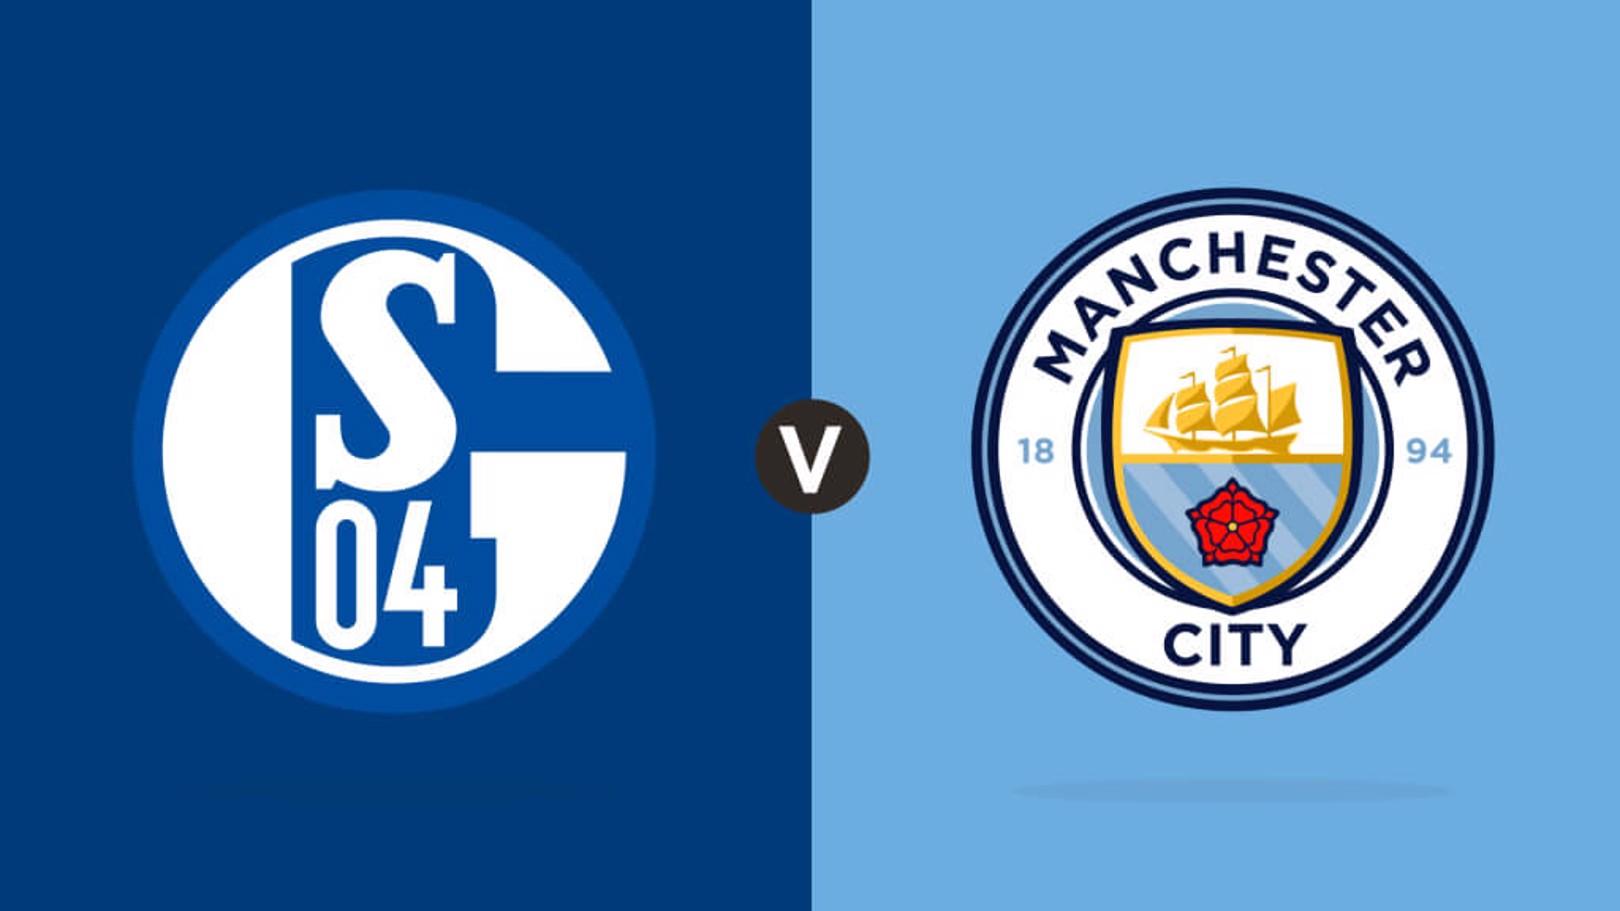 Schalke v City Champions League